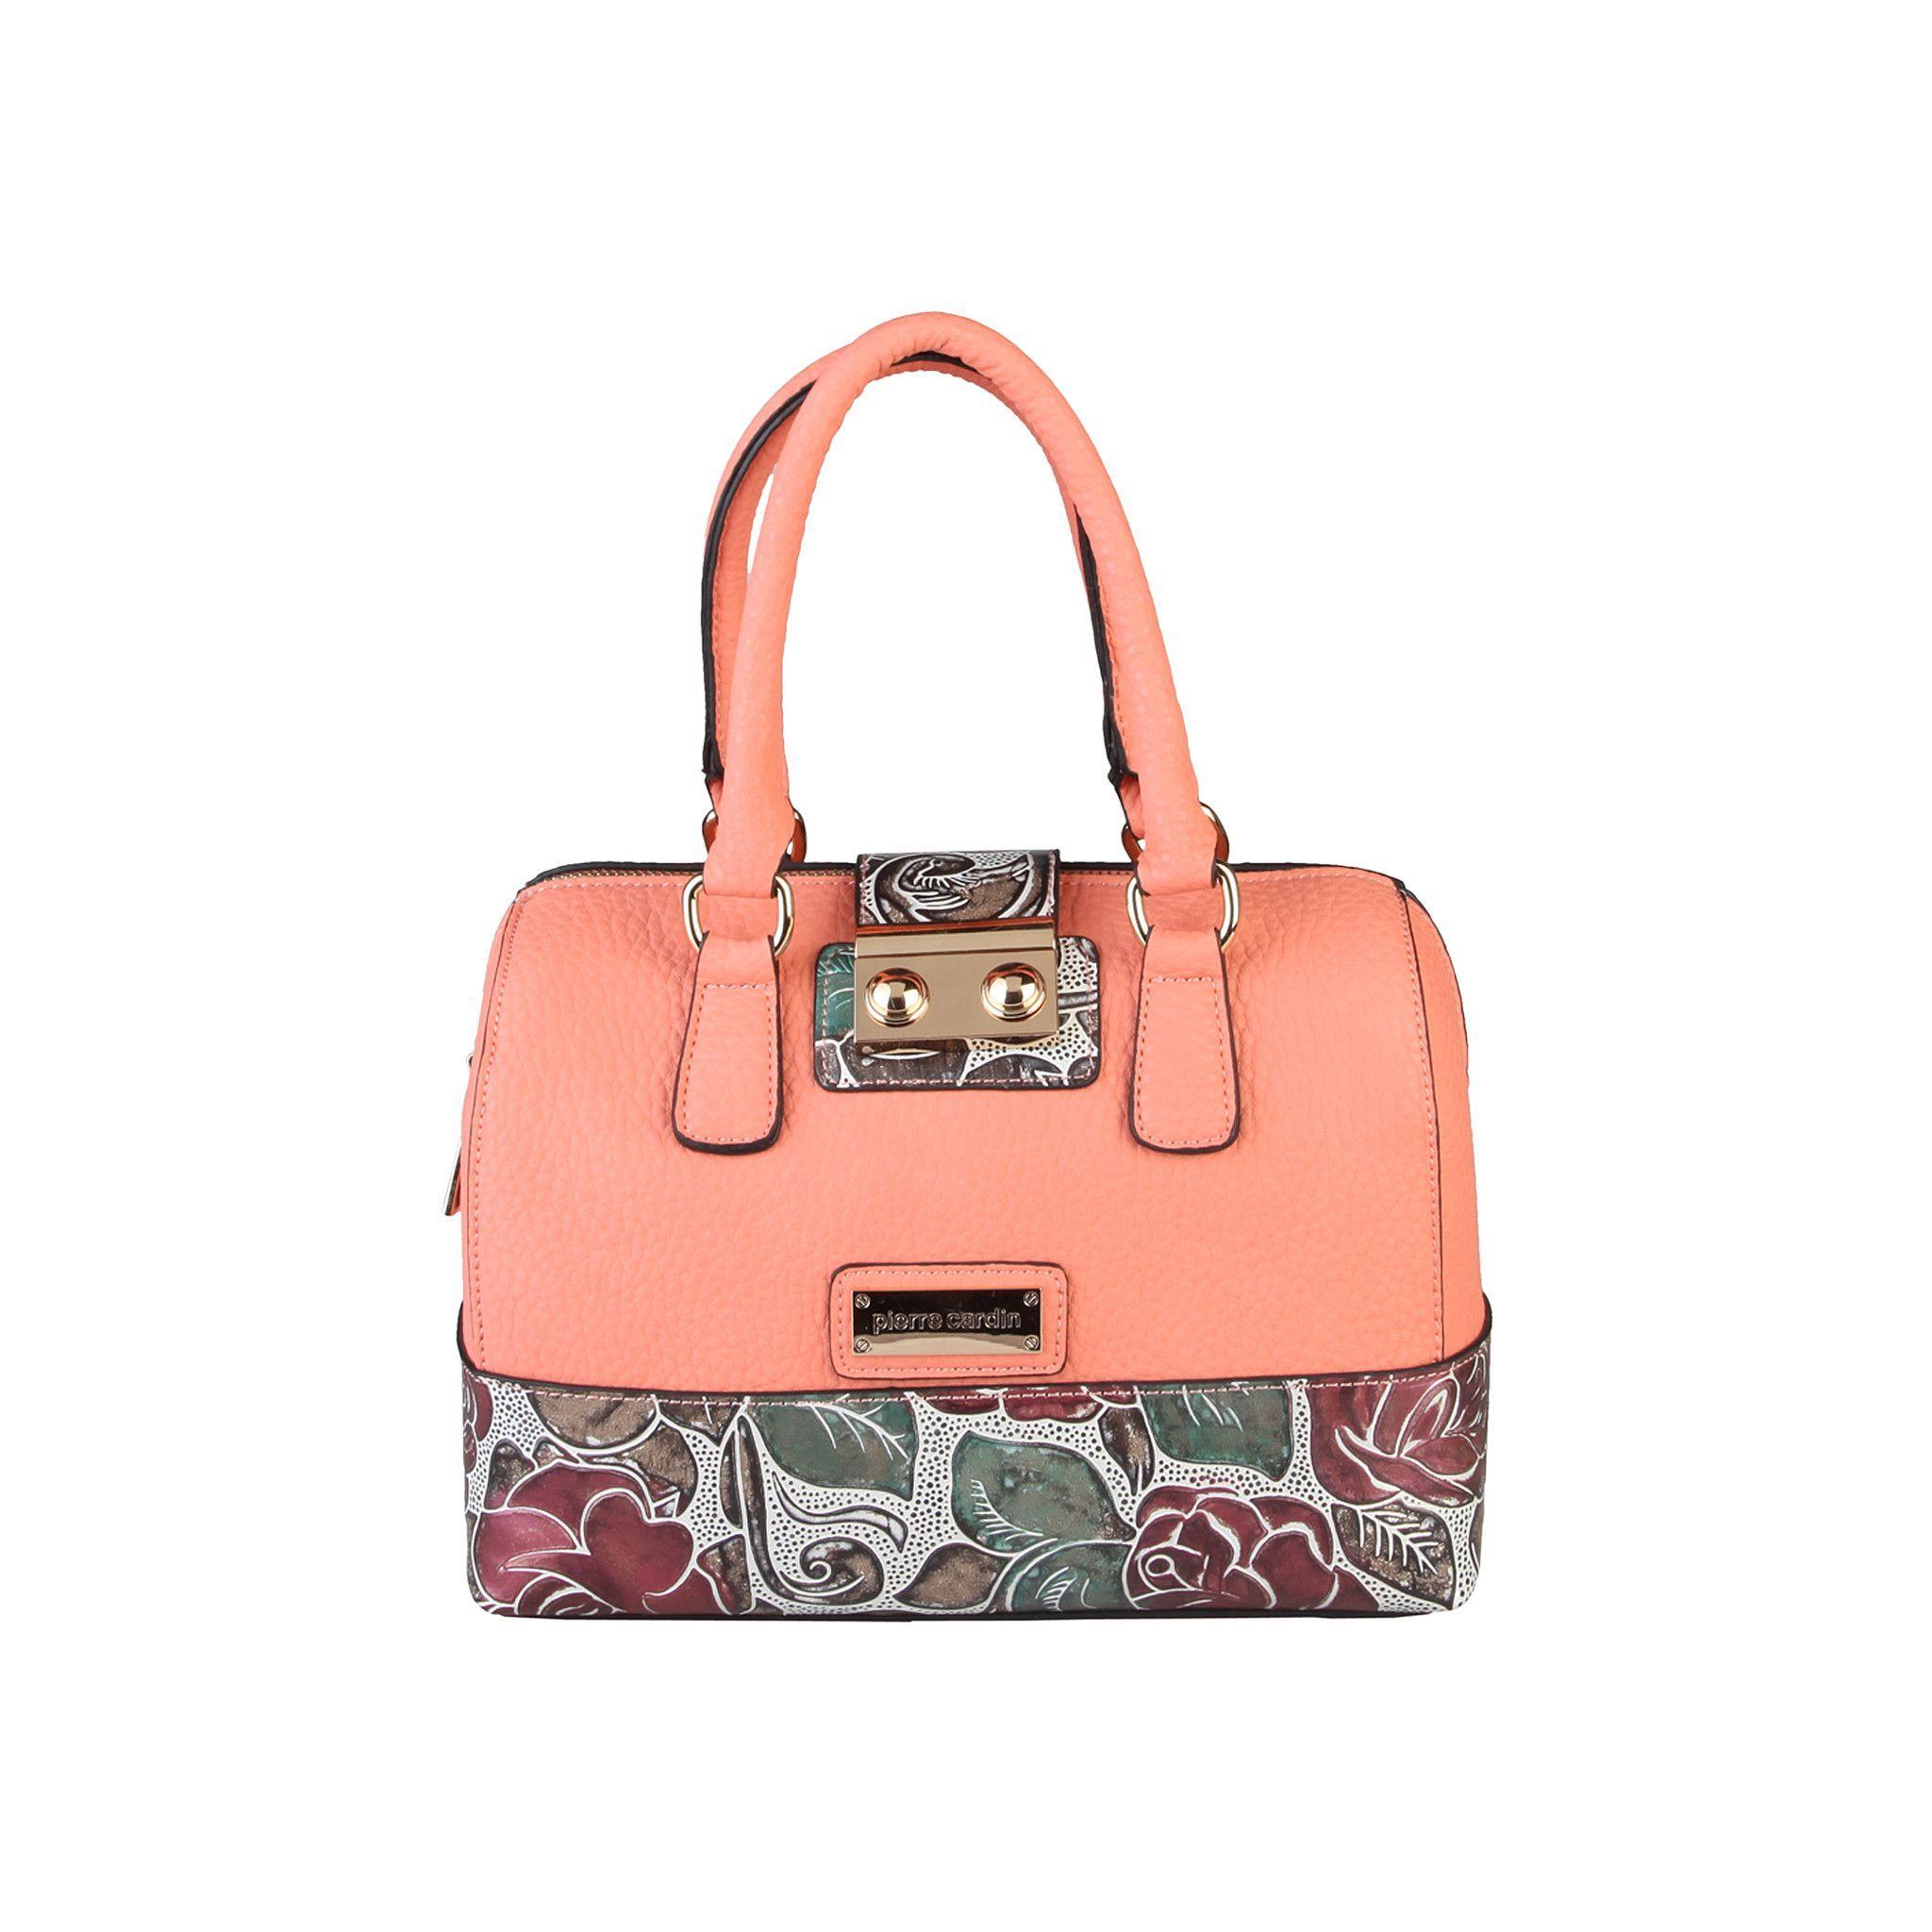 Pierre Cardin New Rose Pink Leather Hobo Bag Handbag hymlS3Ouy